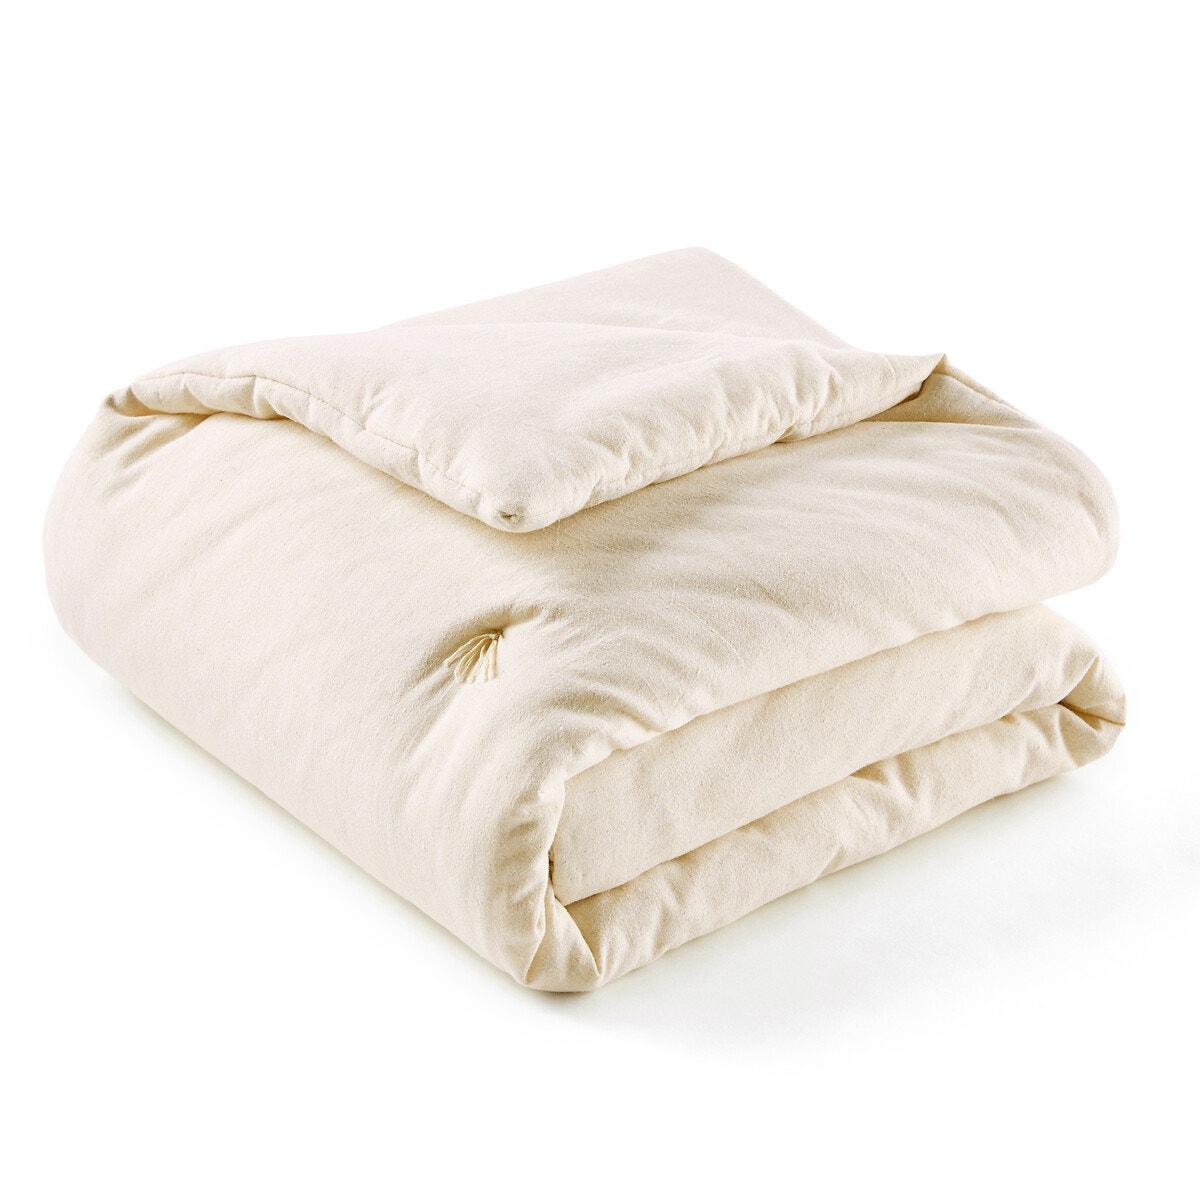 Abella リネン/ウォッシュ加工コットン 中綿入りベッドスプレッド